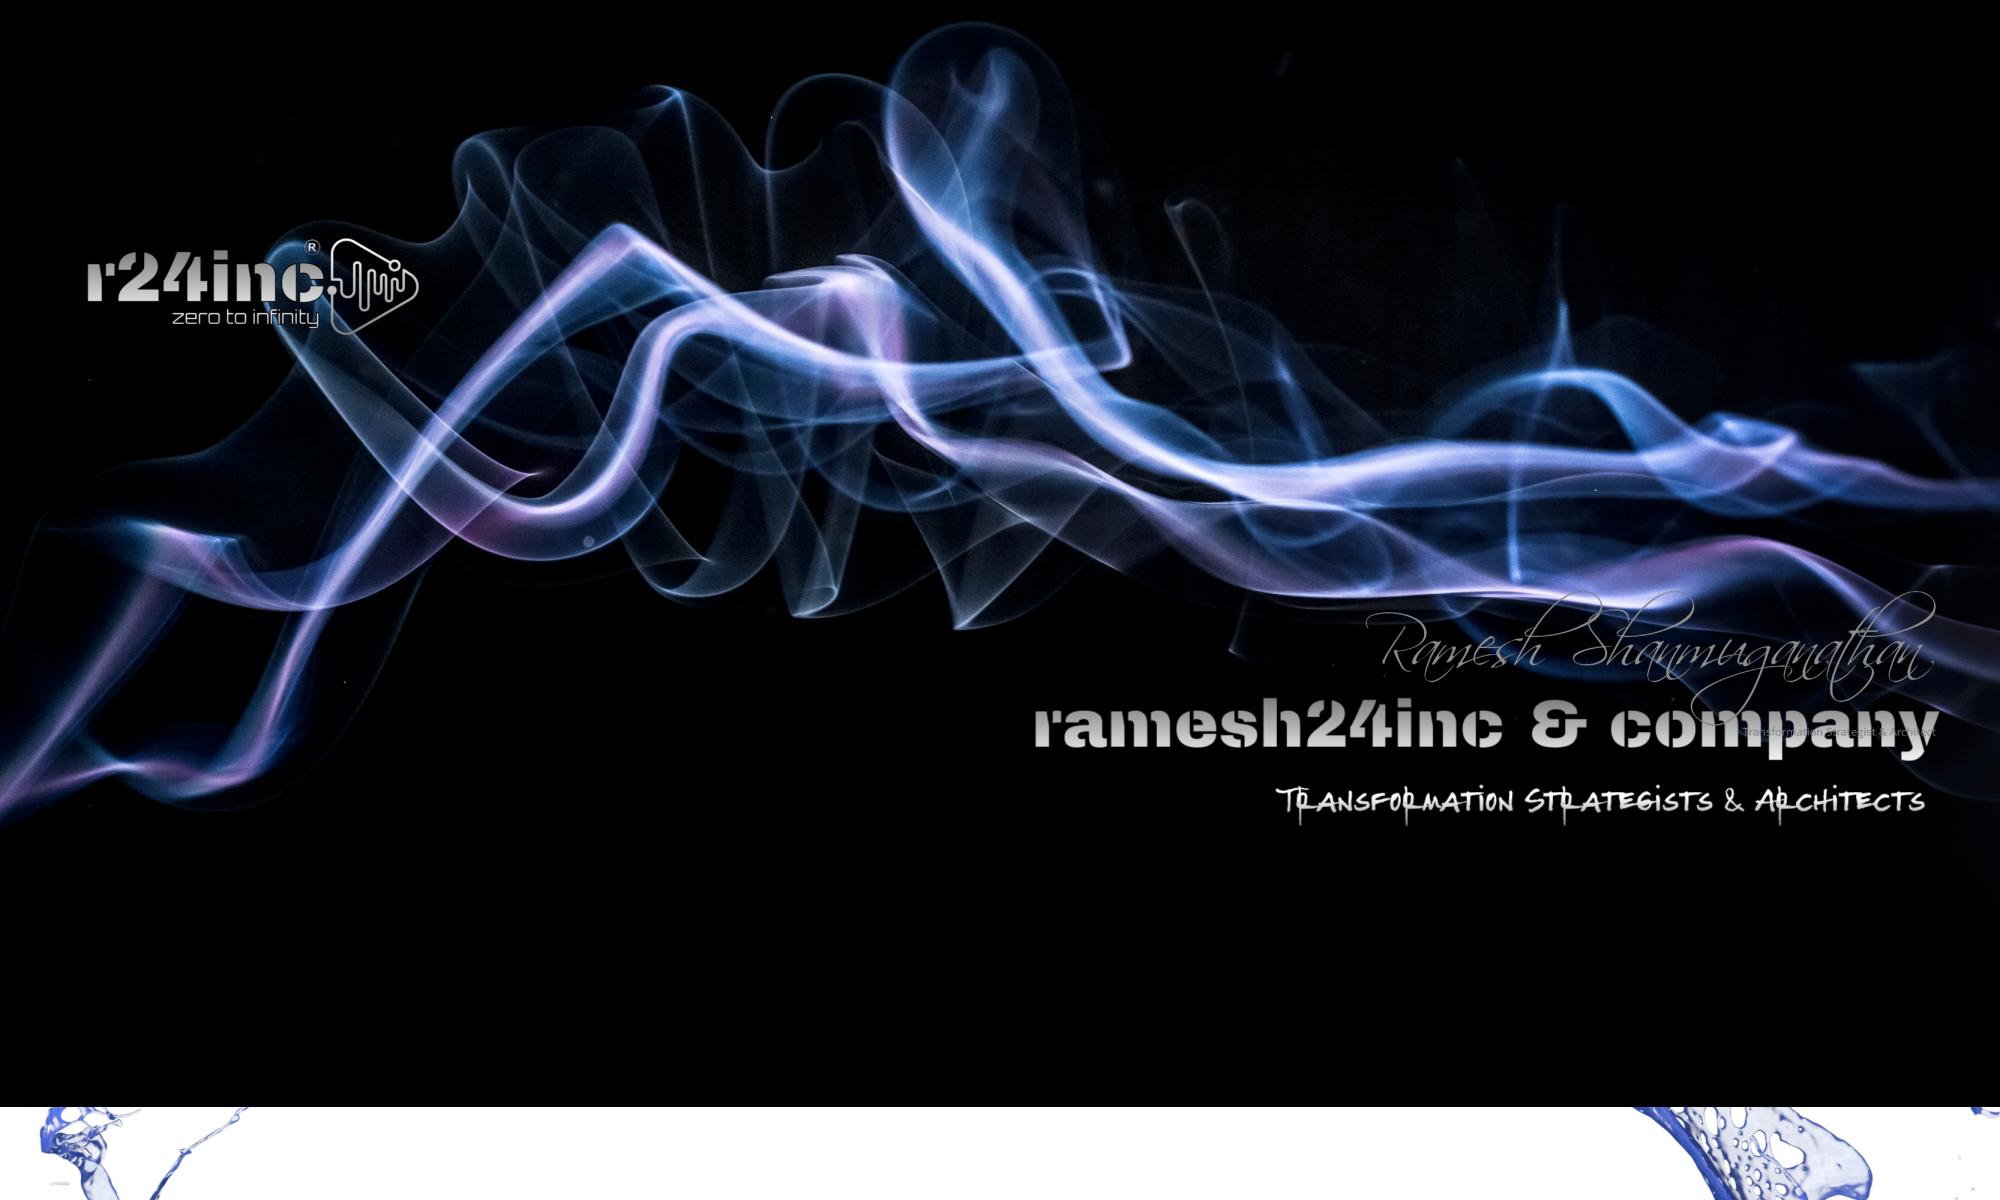 ramesh24inc & company